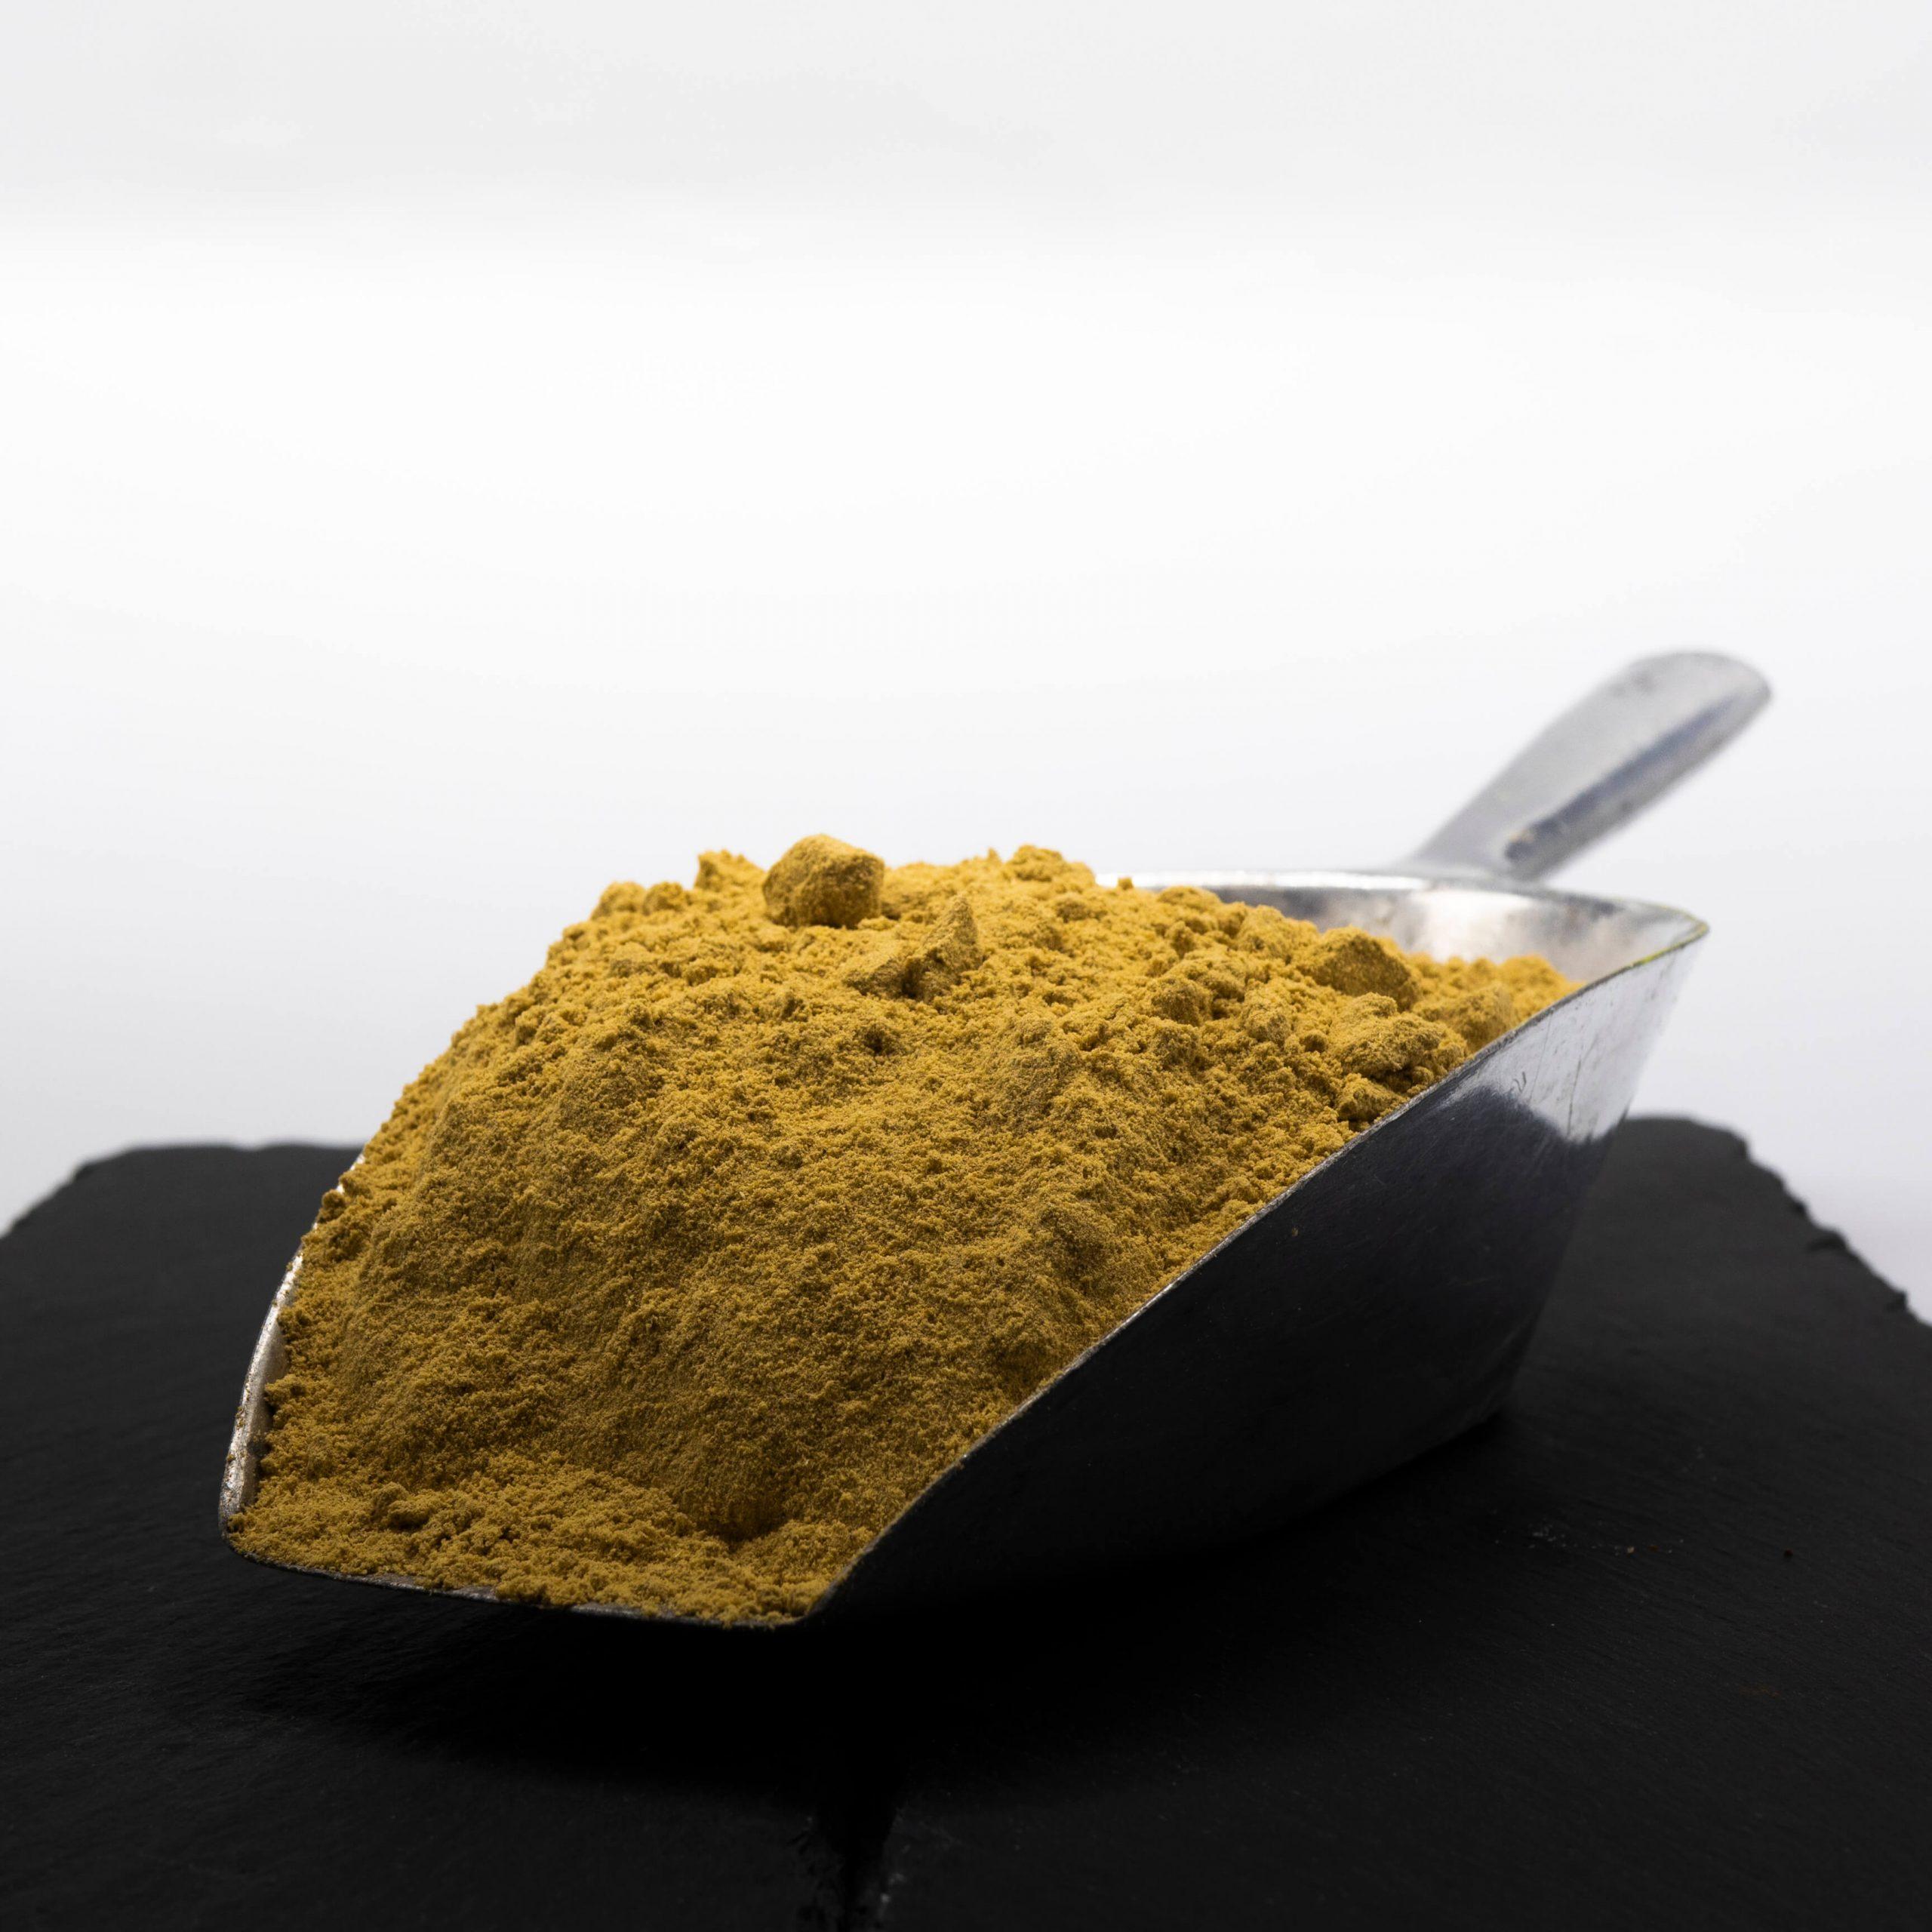 GLM Extract vollfett - Fischmehl